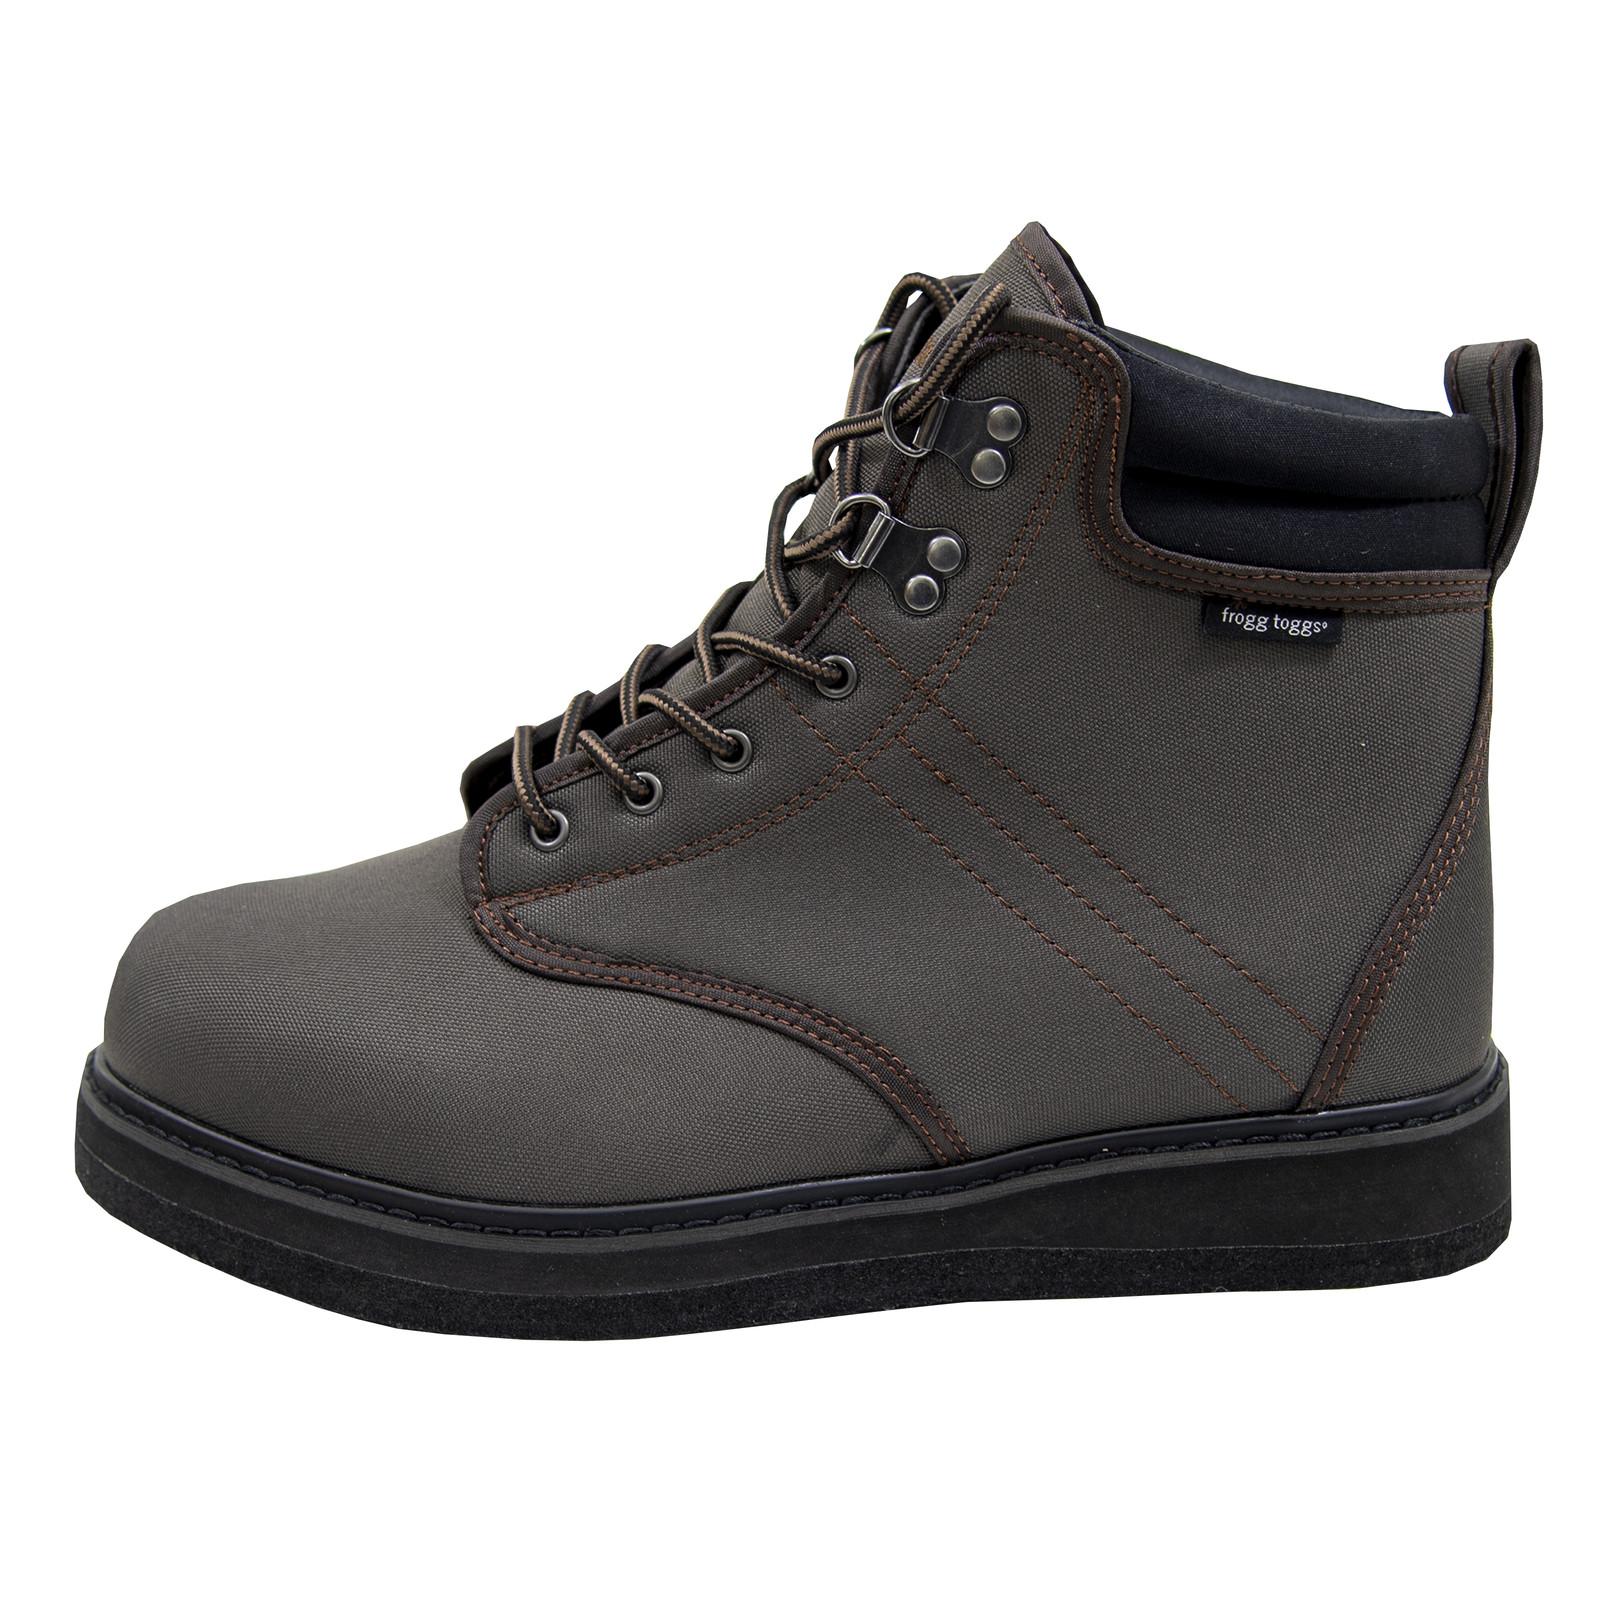 Men's Rana Elite Wading Boots - Felt